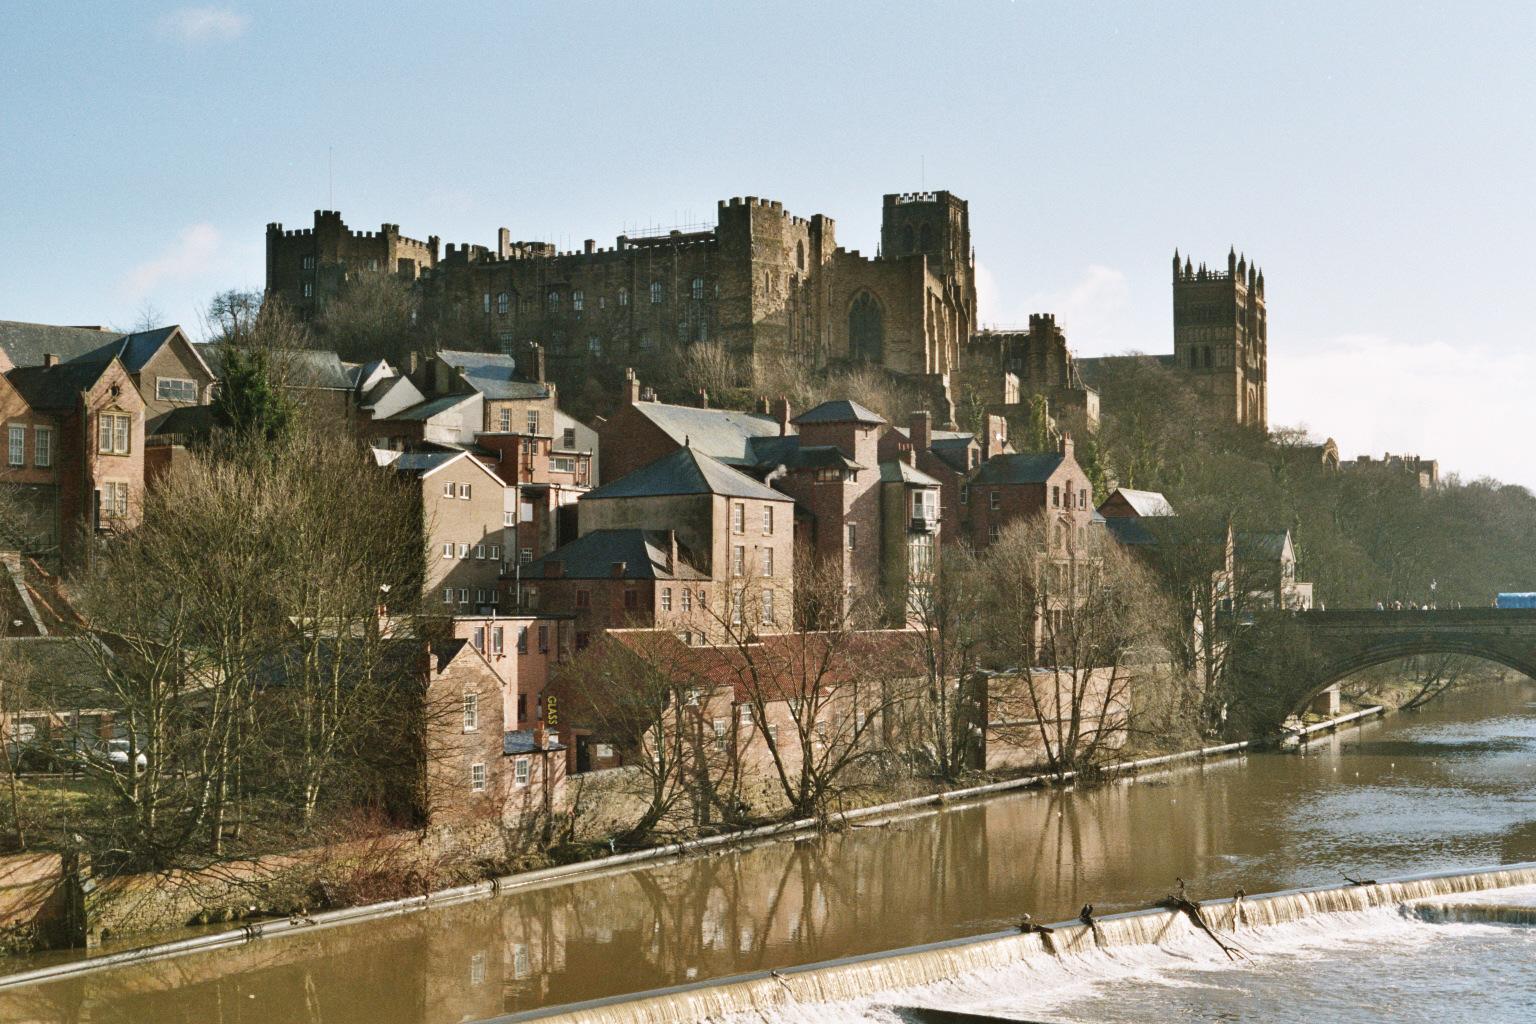 http://upload.wikimedia.org/wikipedia/commons/1/11/Durham_castle.jpg